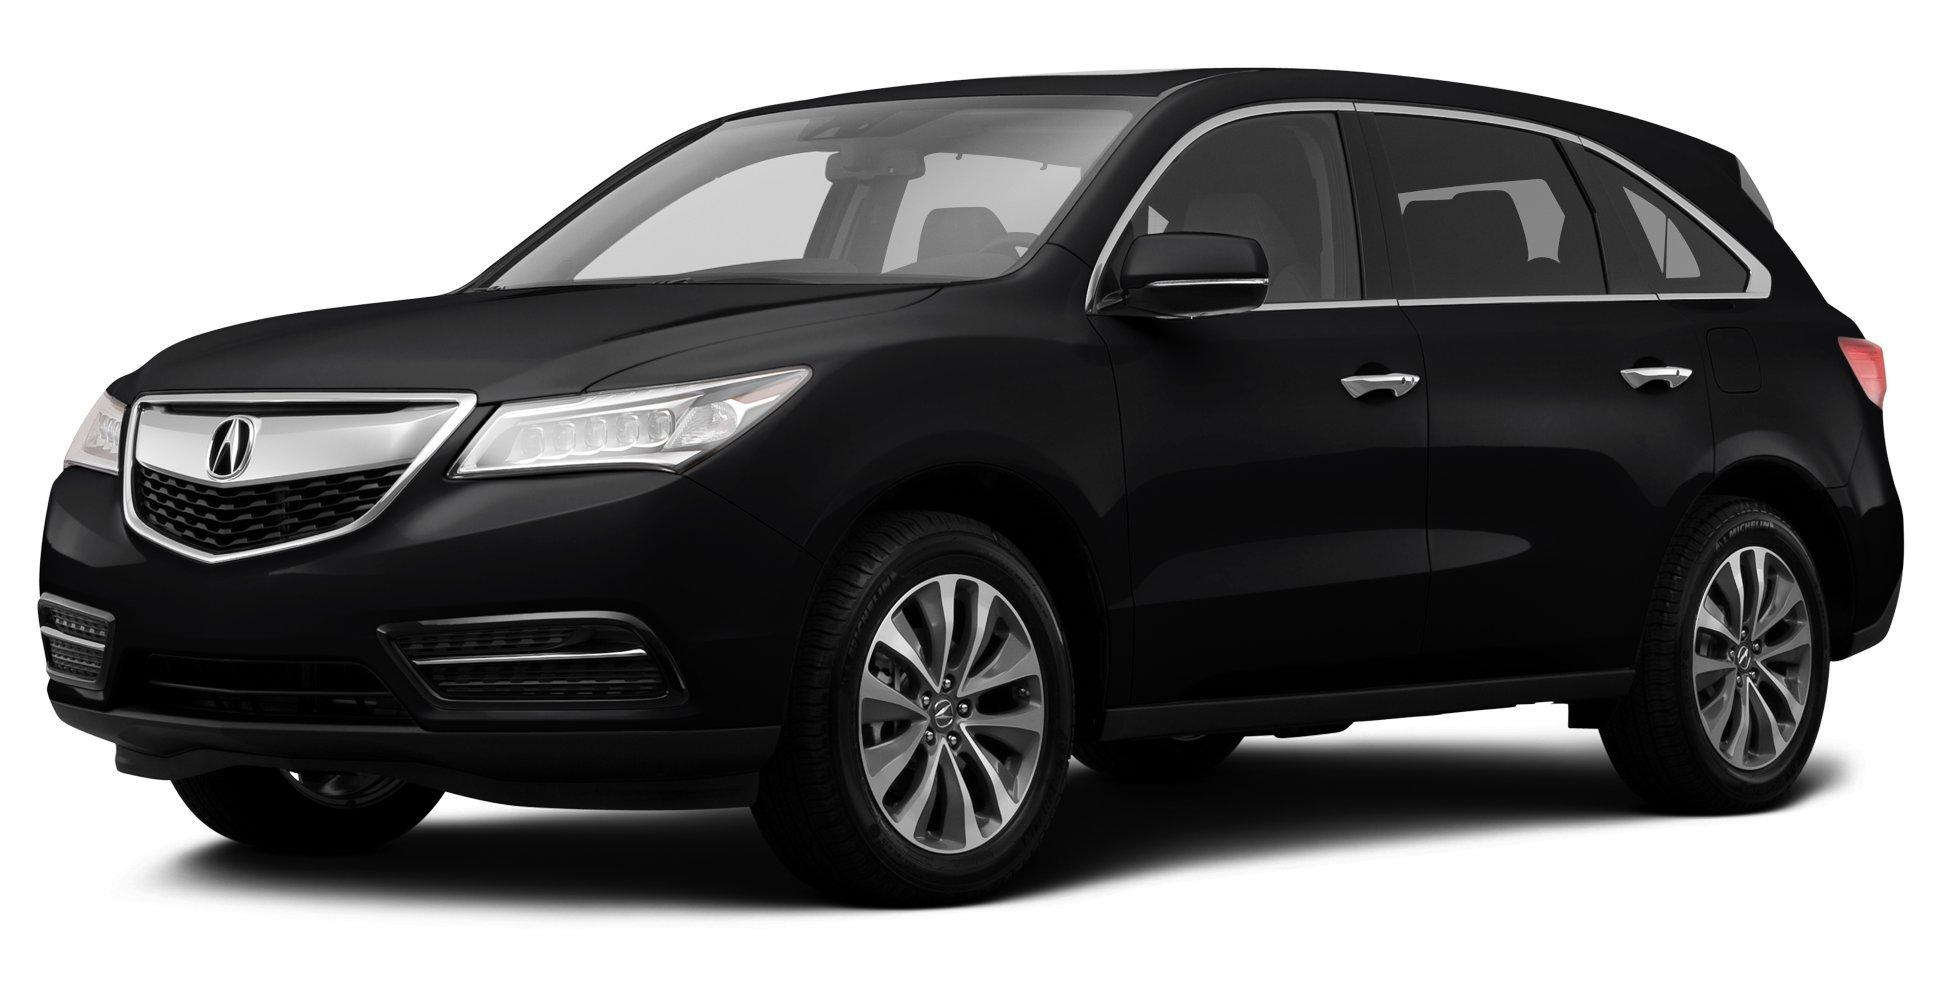 Infiniti Qx60 Seating Capacity >> Amazon.com: 2015 Toyota Highlander Reviews, Images, and ...